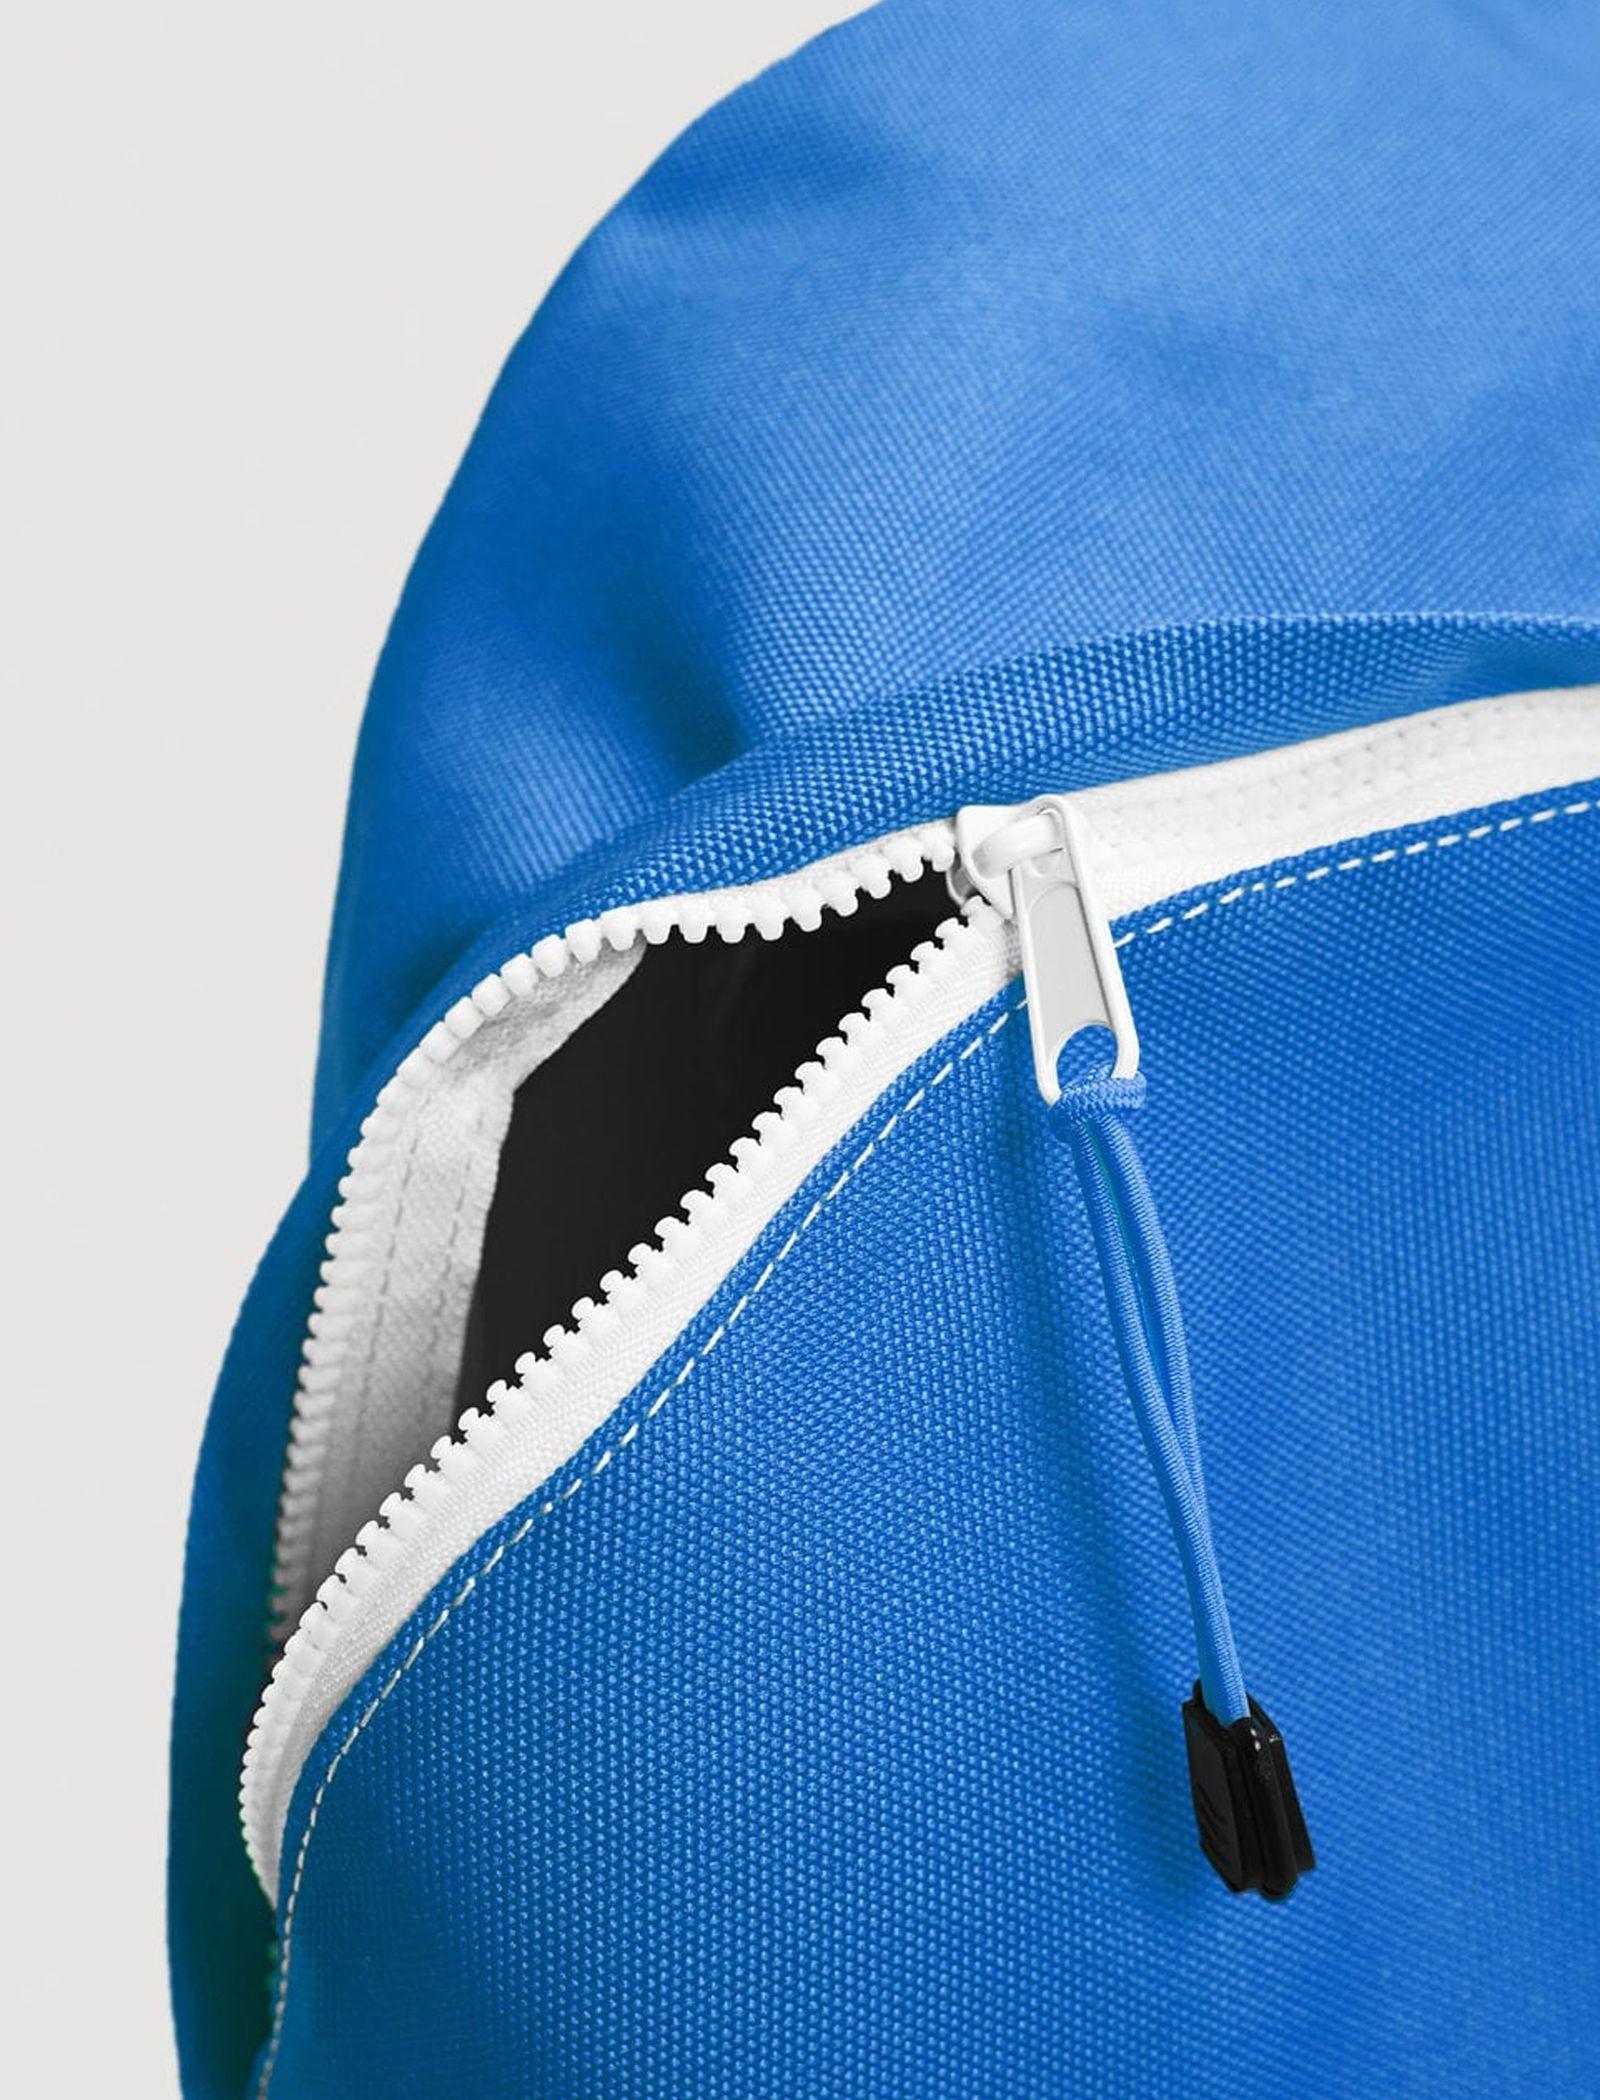 کوله پشتی روزمره مردانه - مانگو تک سایز - آبي  - 3